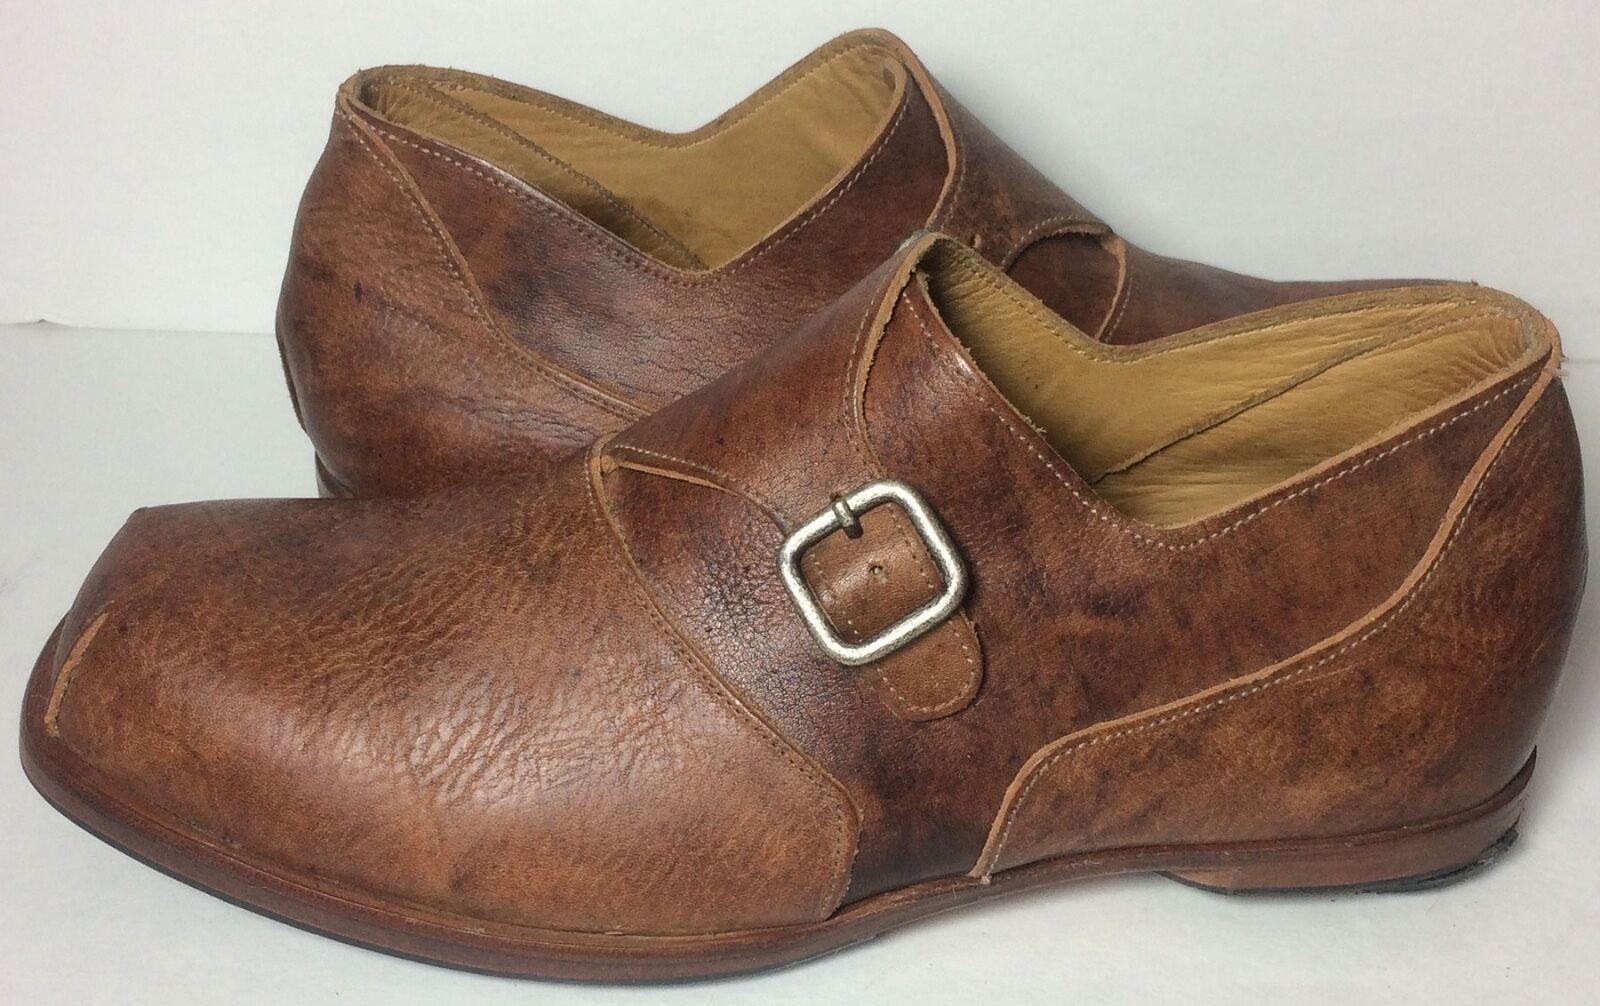 Cydwoq Brown Leather Monk Strap shoes Men's Size 11 US